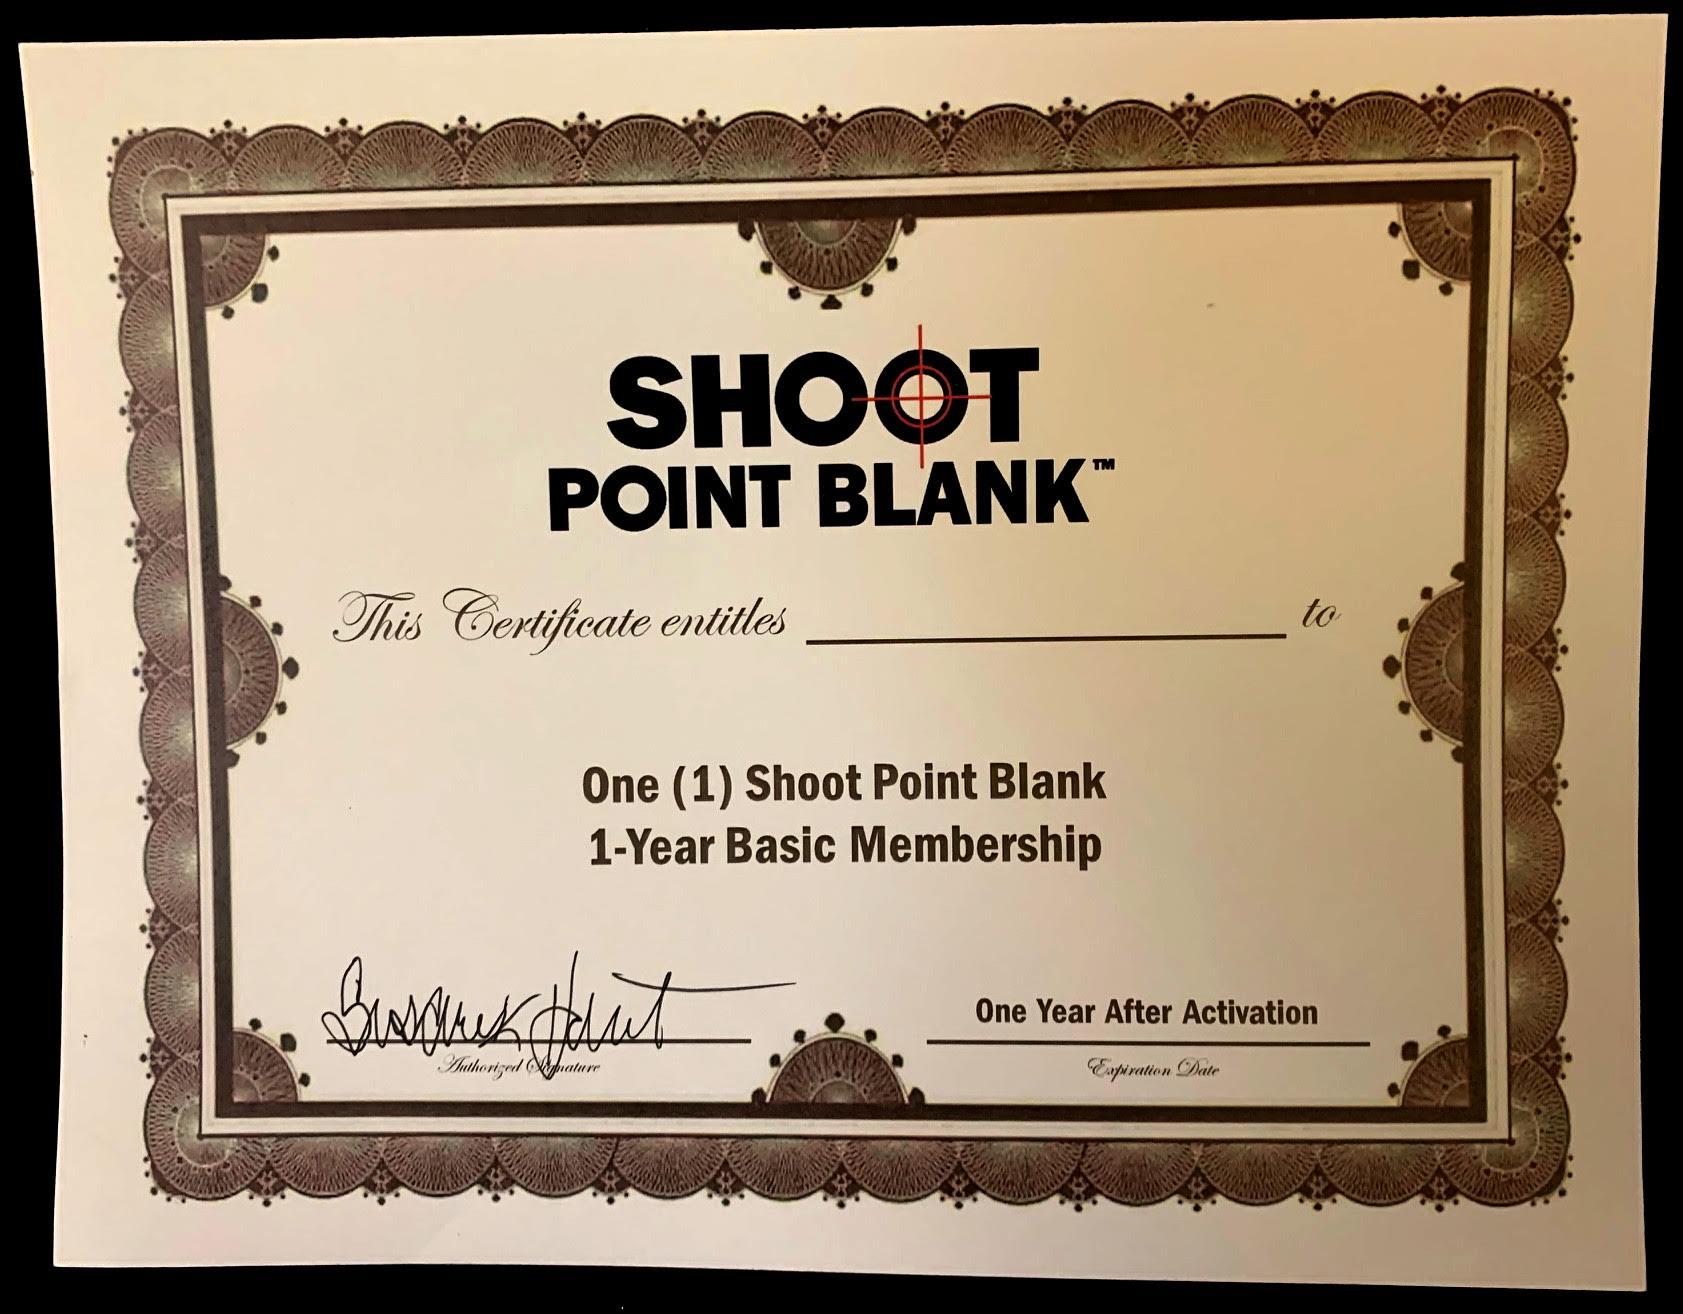 Live_ShootPointBlank_IMG_1996.jpg